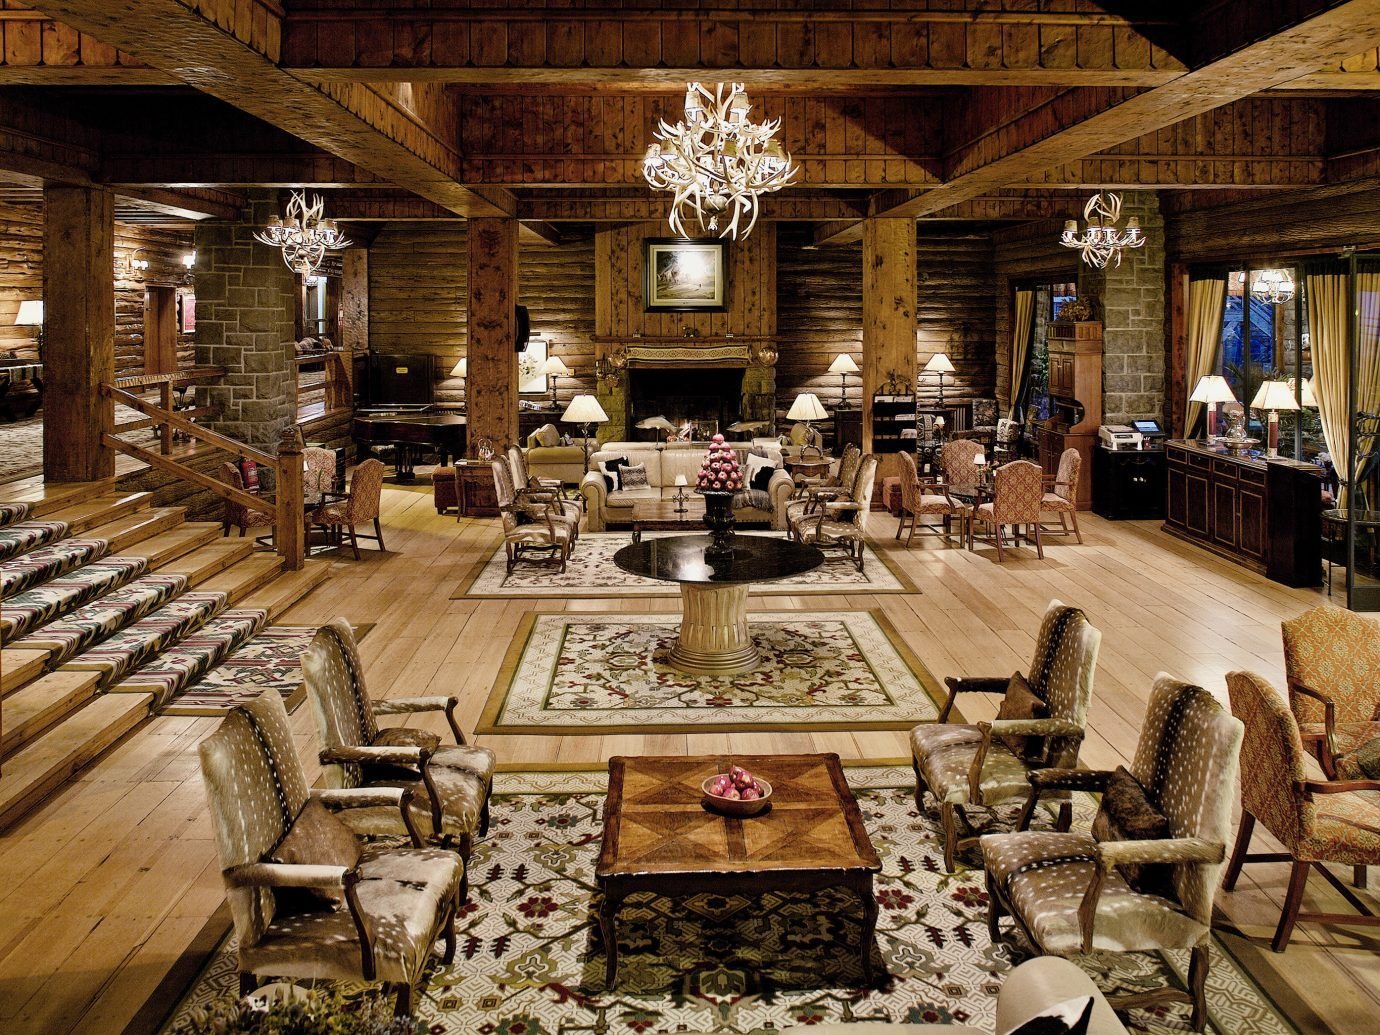 Fireplace Hotels Lobby Lounge Resort Rustic indoor Living estate furniture interior design mansion restaurant ancient history several